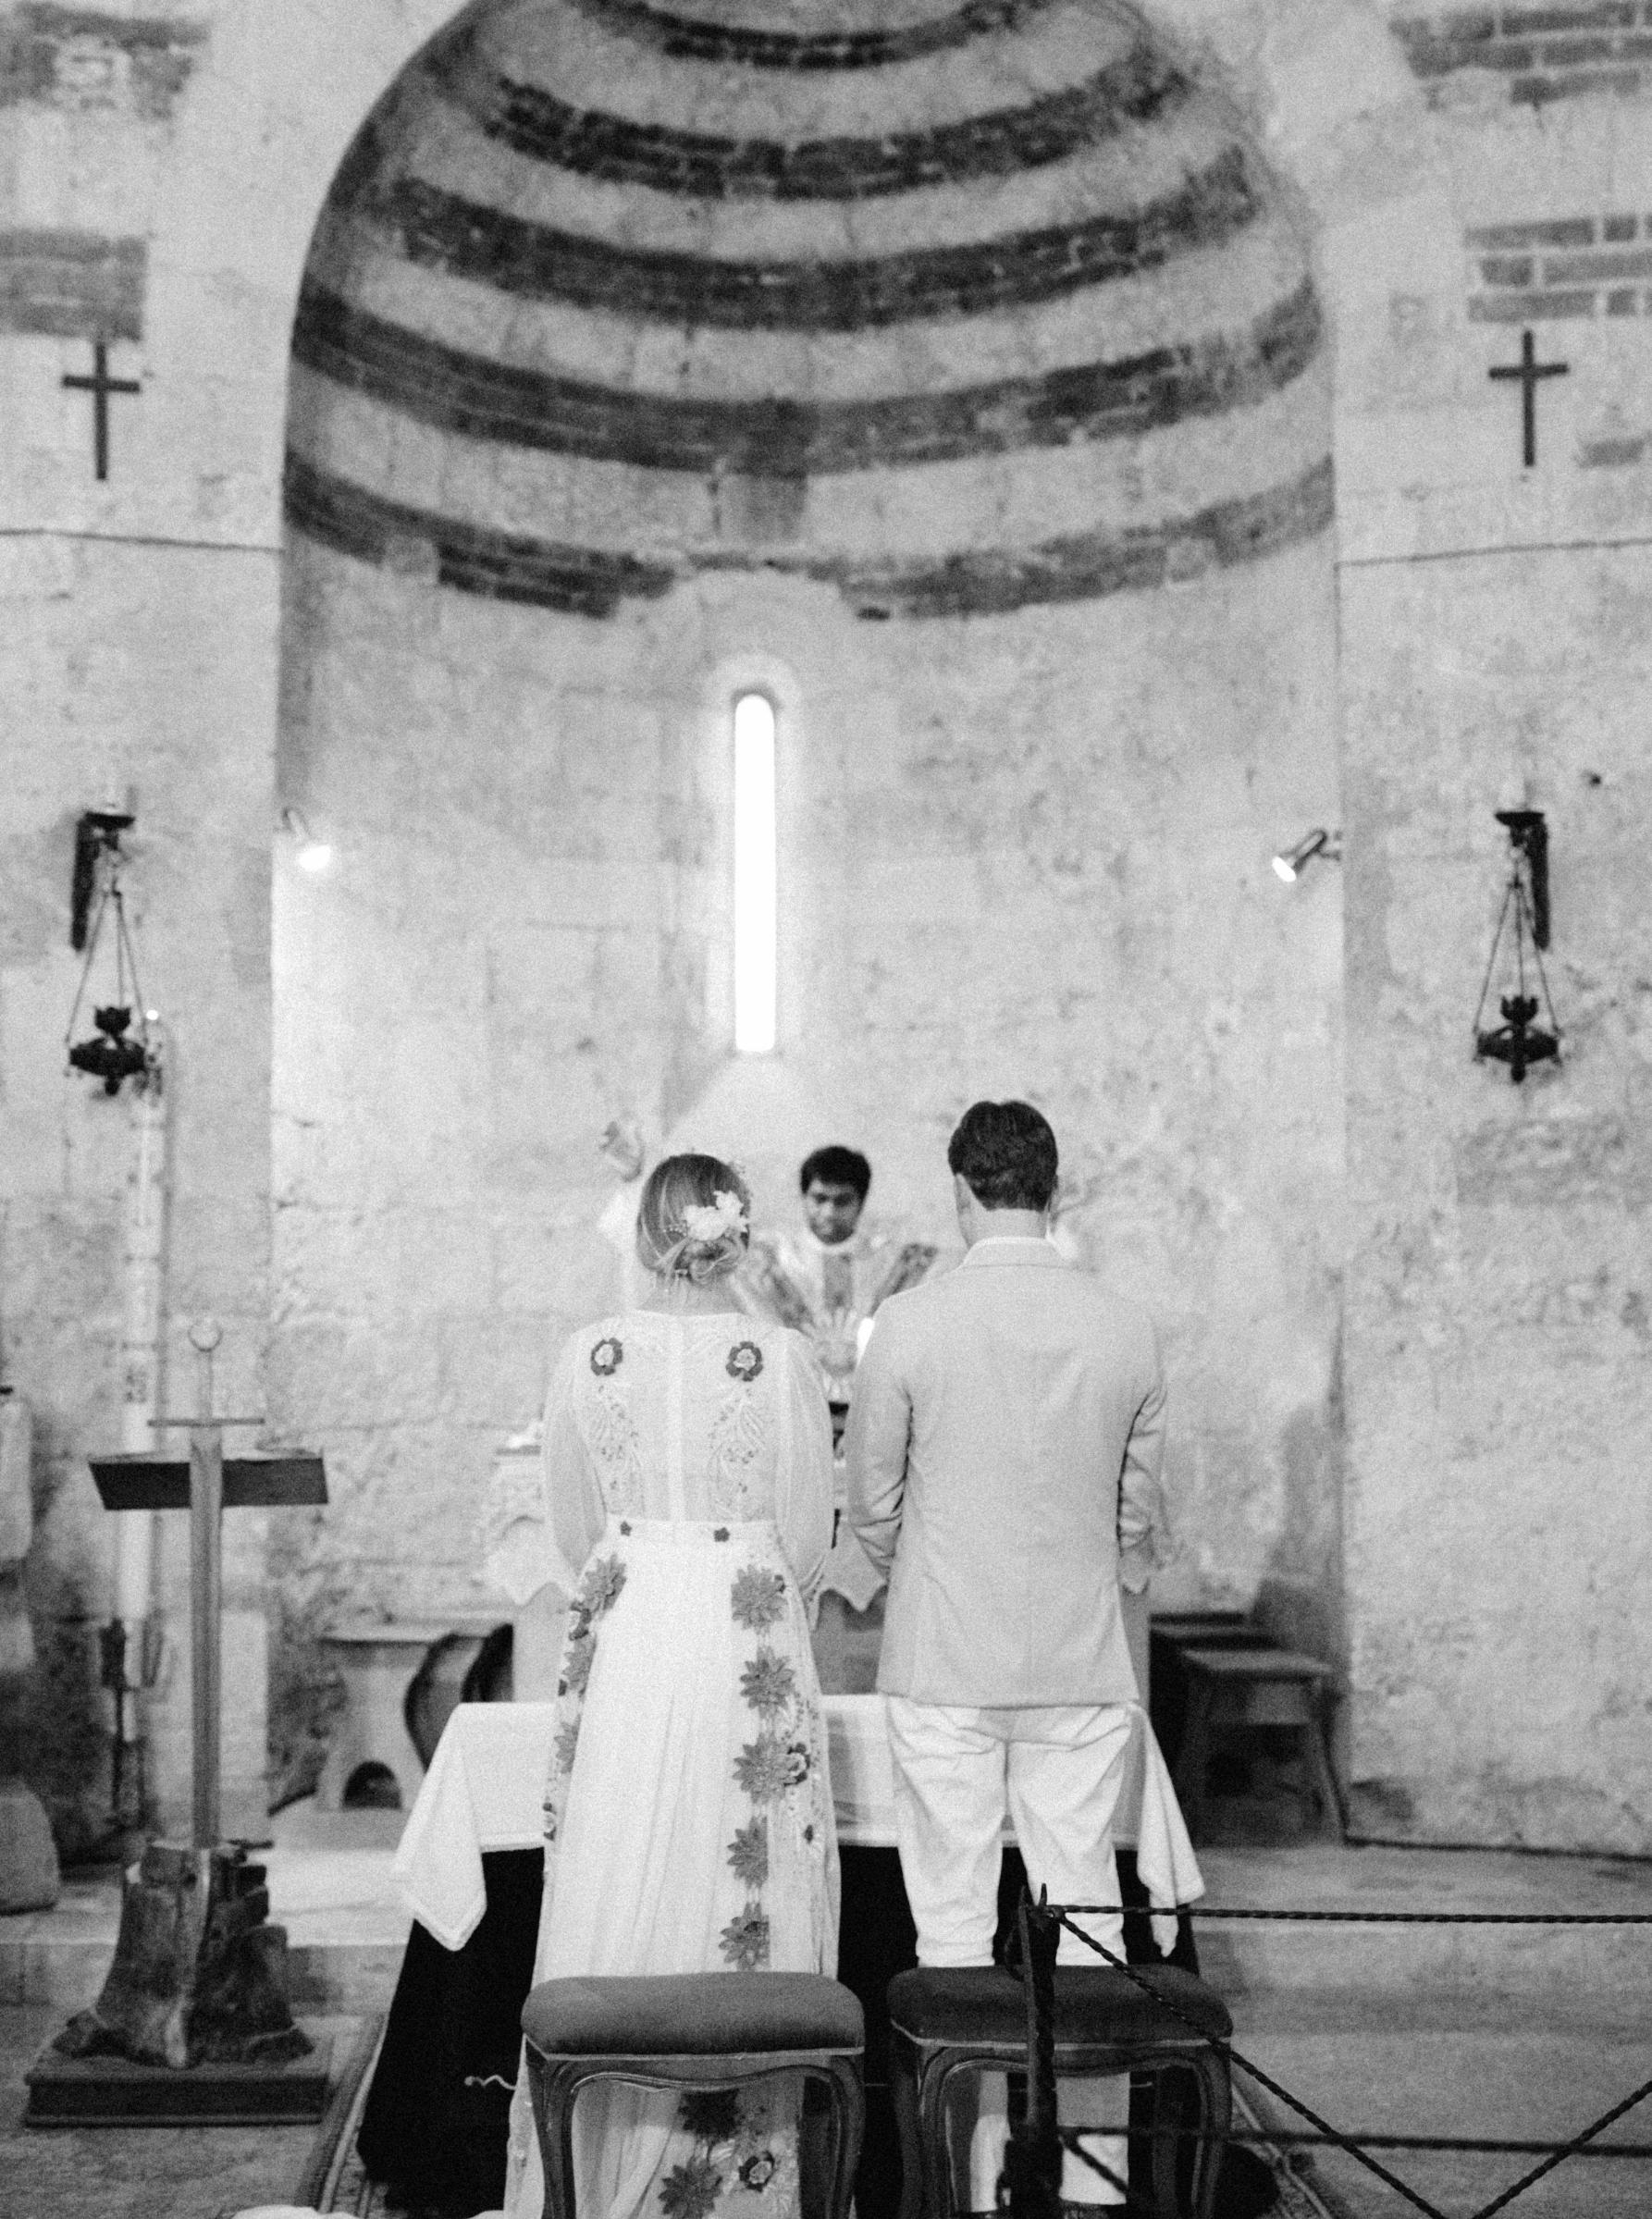 Kyle John l Fine Art Wedding Photography l Chicago, Copenhagen, California, New York, Destination l Blog l Alexis and Zach_Borgo Santo Pietro_Italy_Tuscany_44